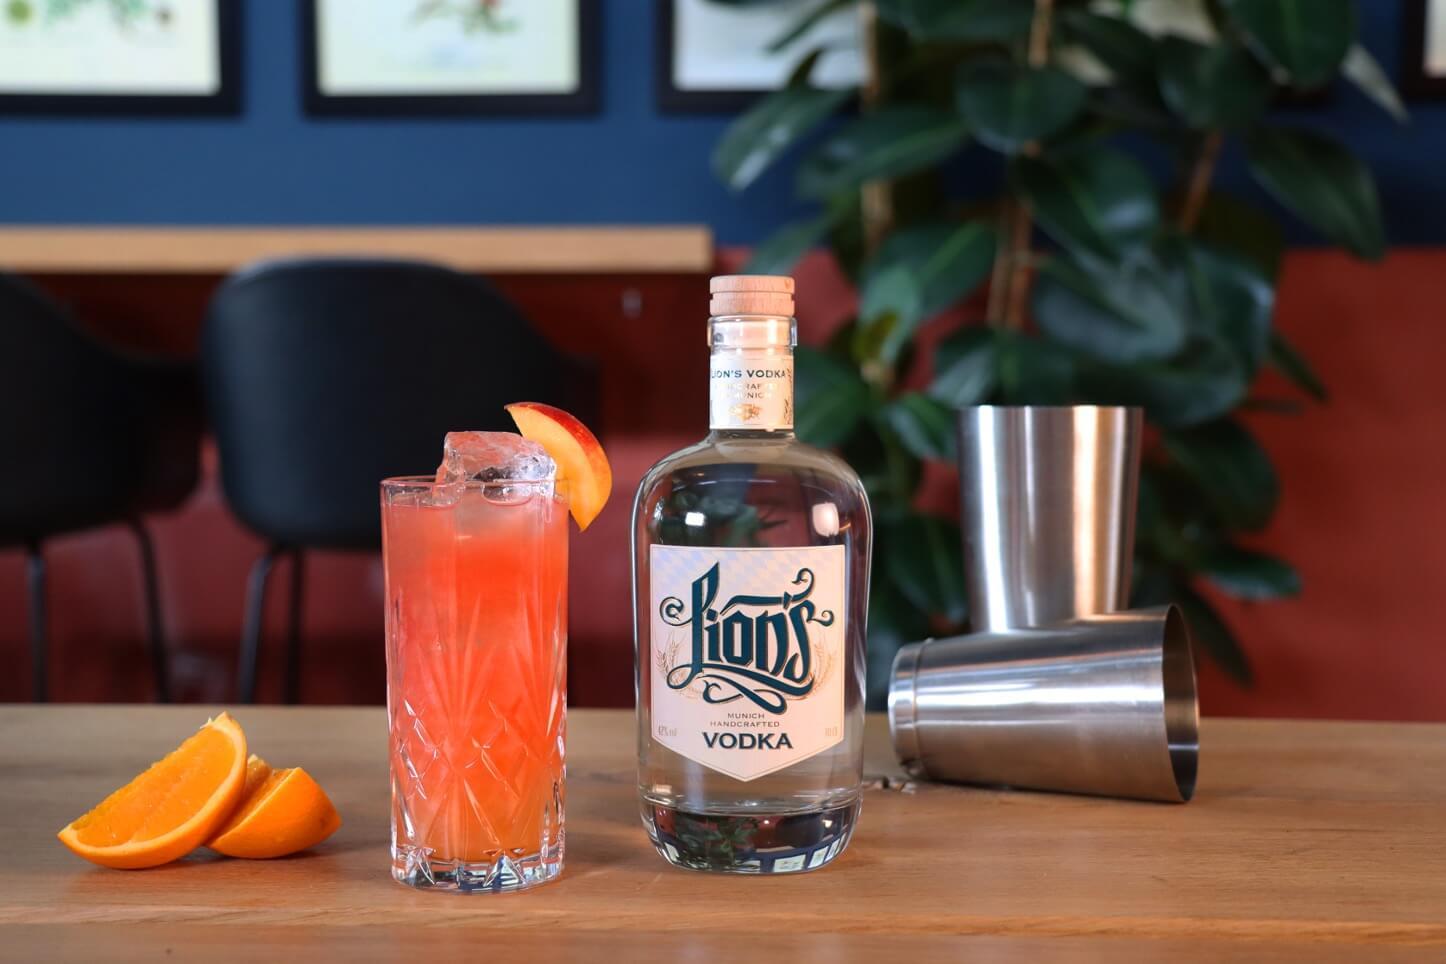 Vodka Drink Klassiker mit LION's Vodka in der The Duke Destillerie